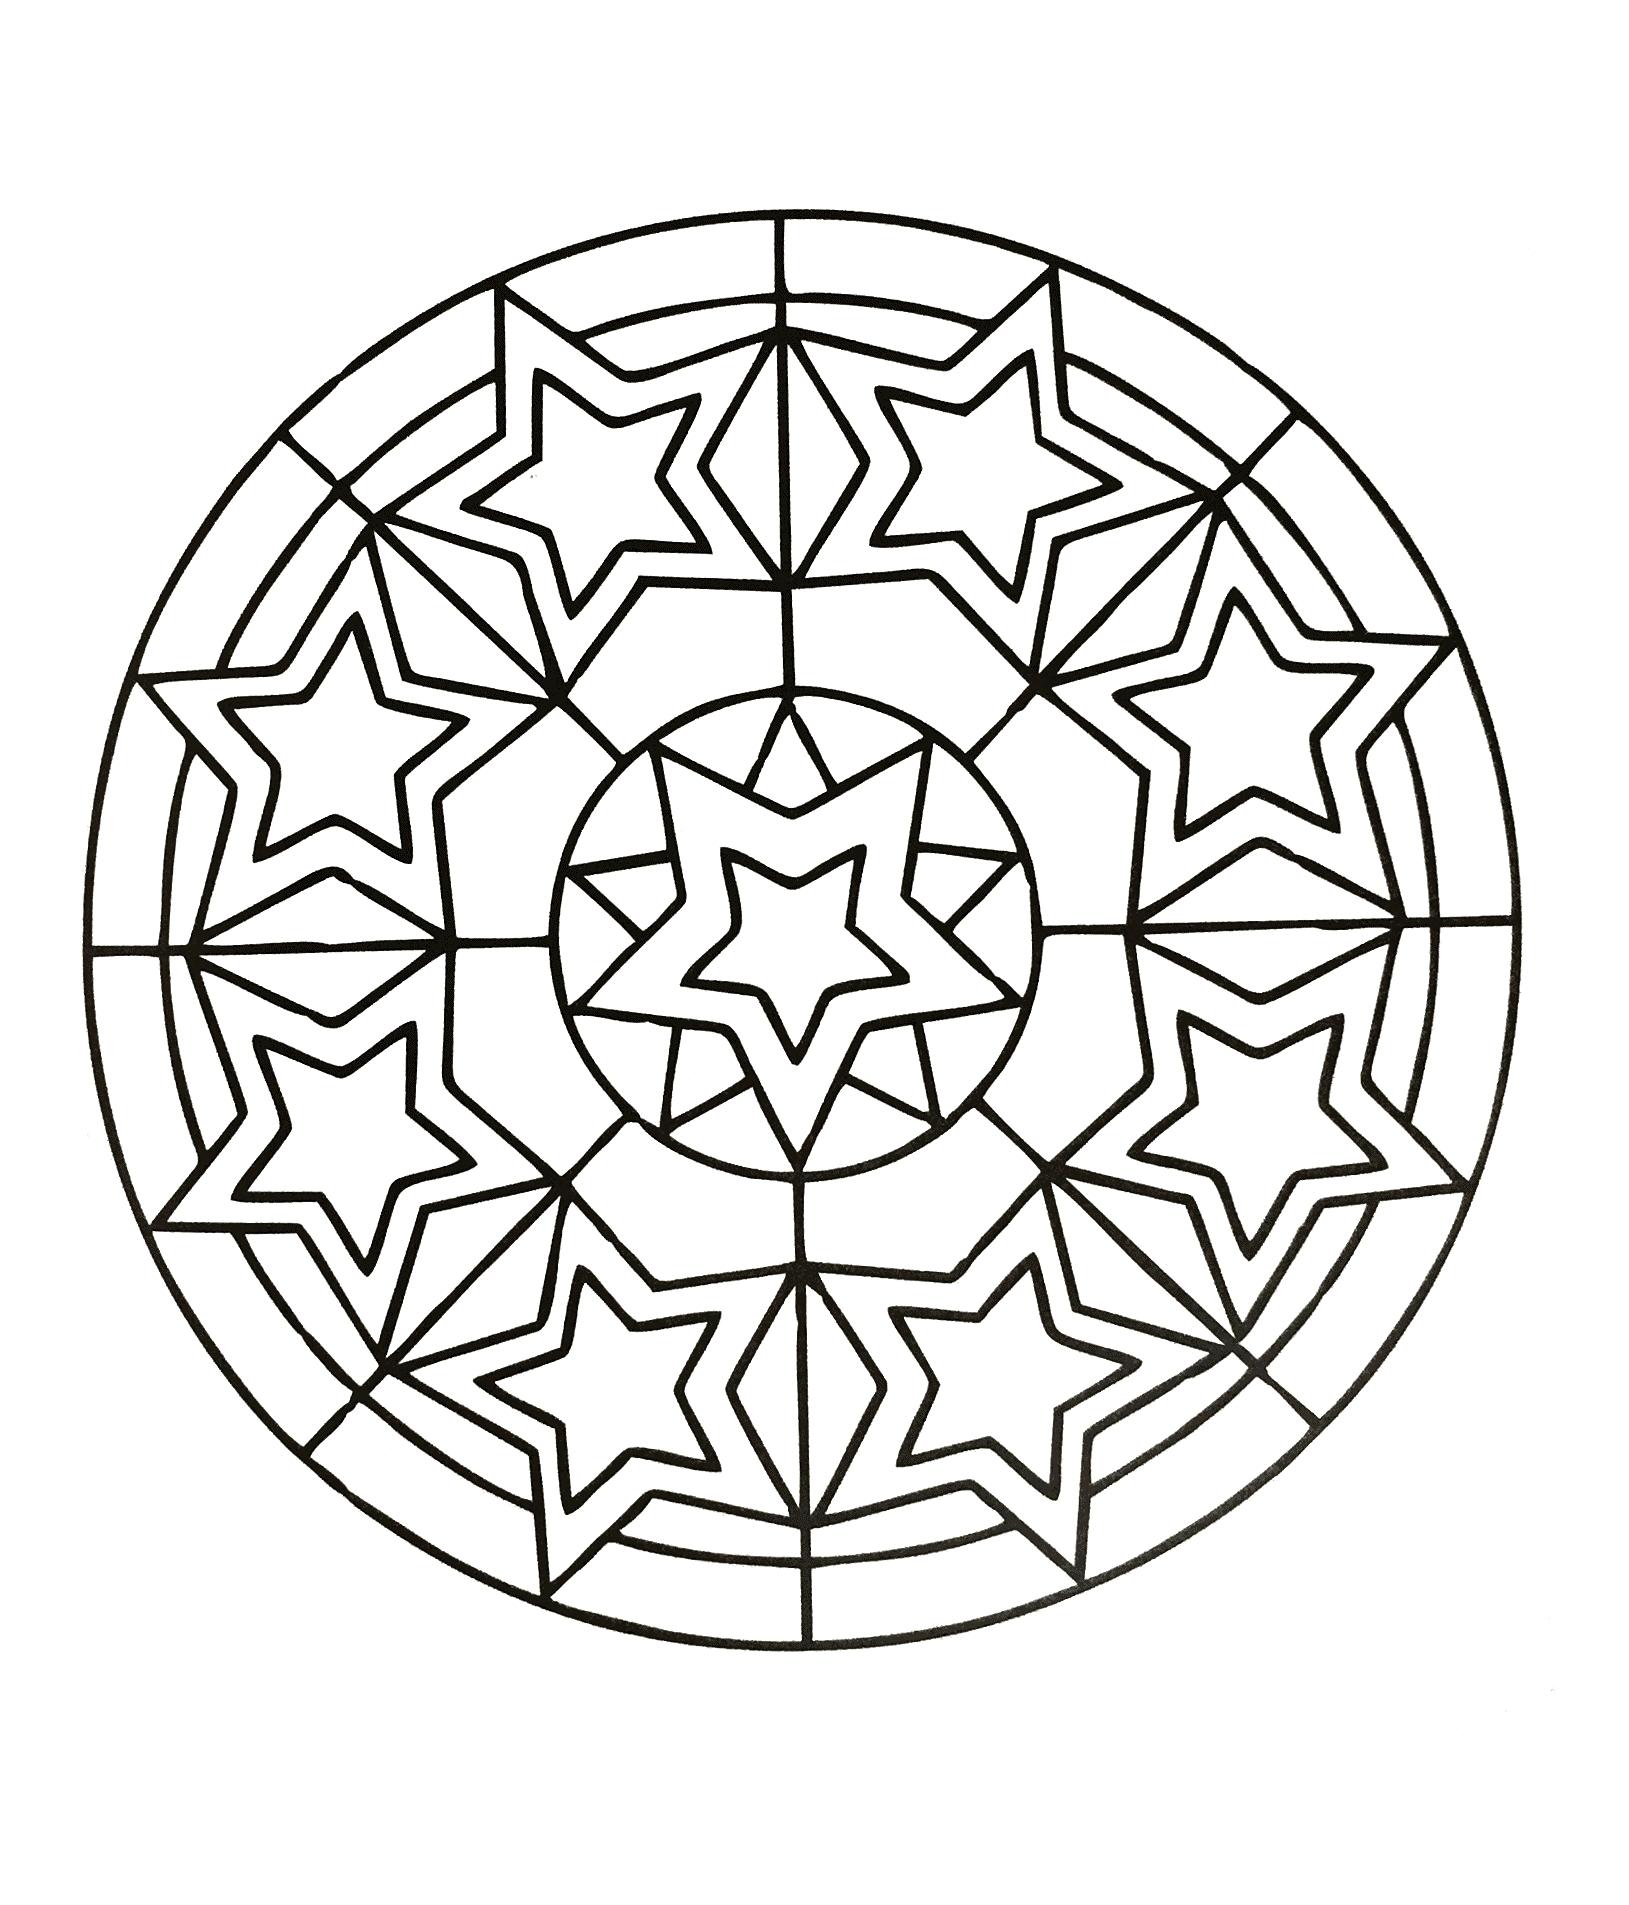 1629x1905 Fresh Simple Mandala Coloring Pages Gallery Printable Coloring Sheet